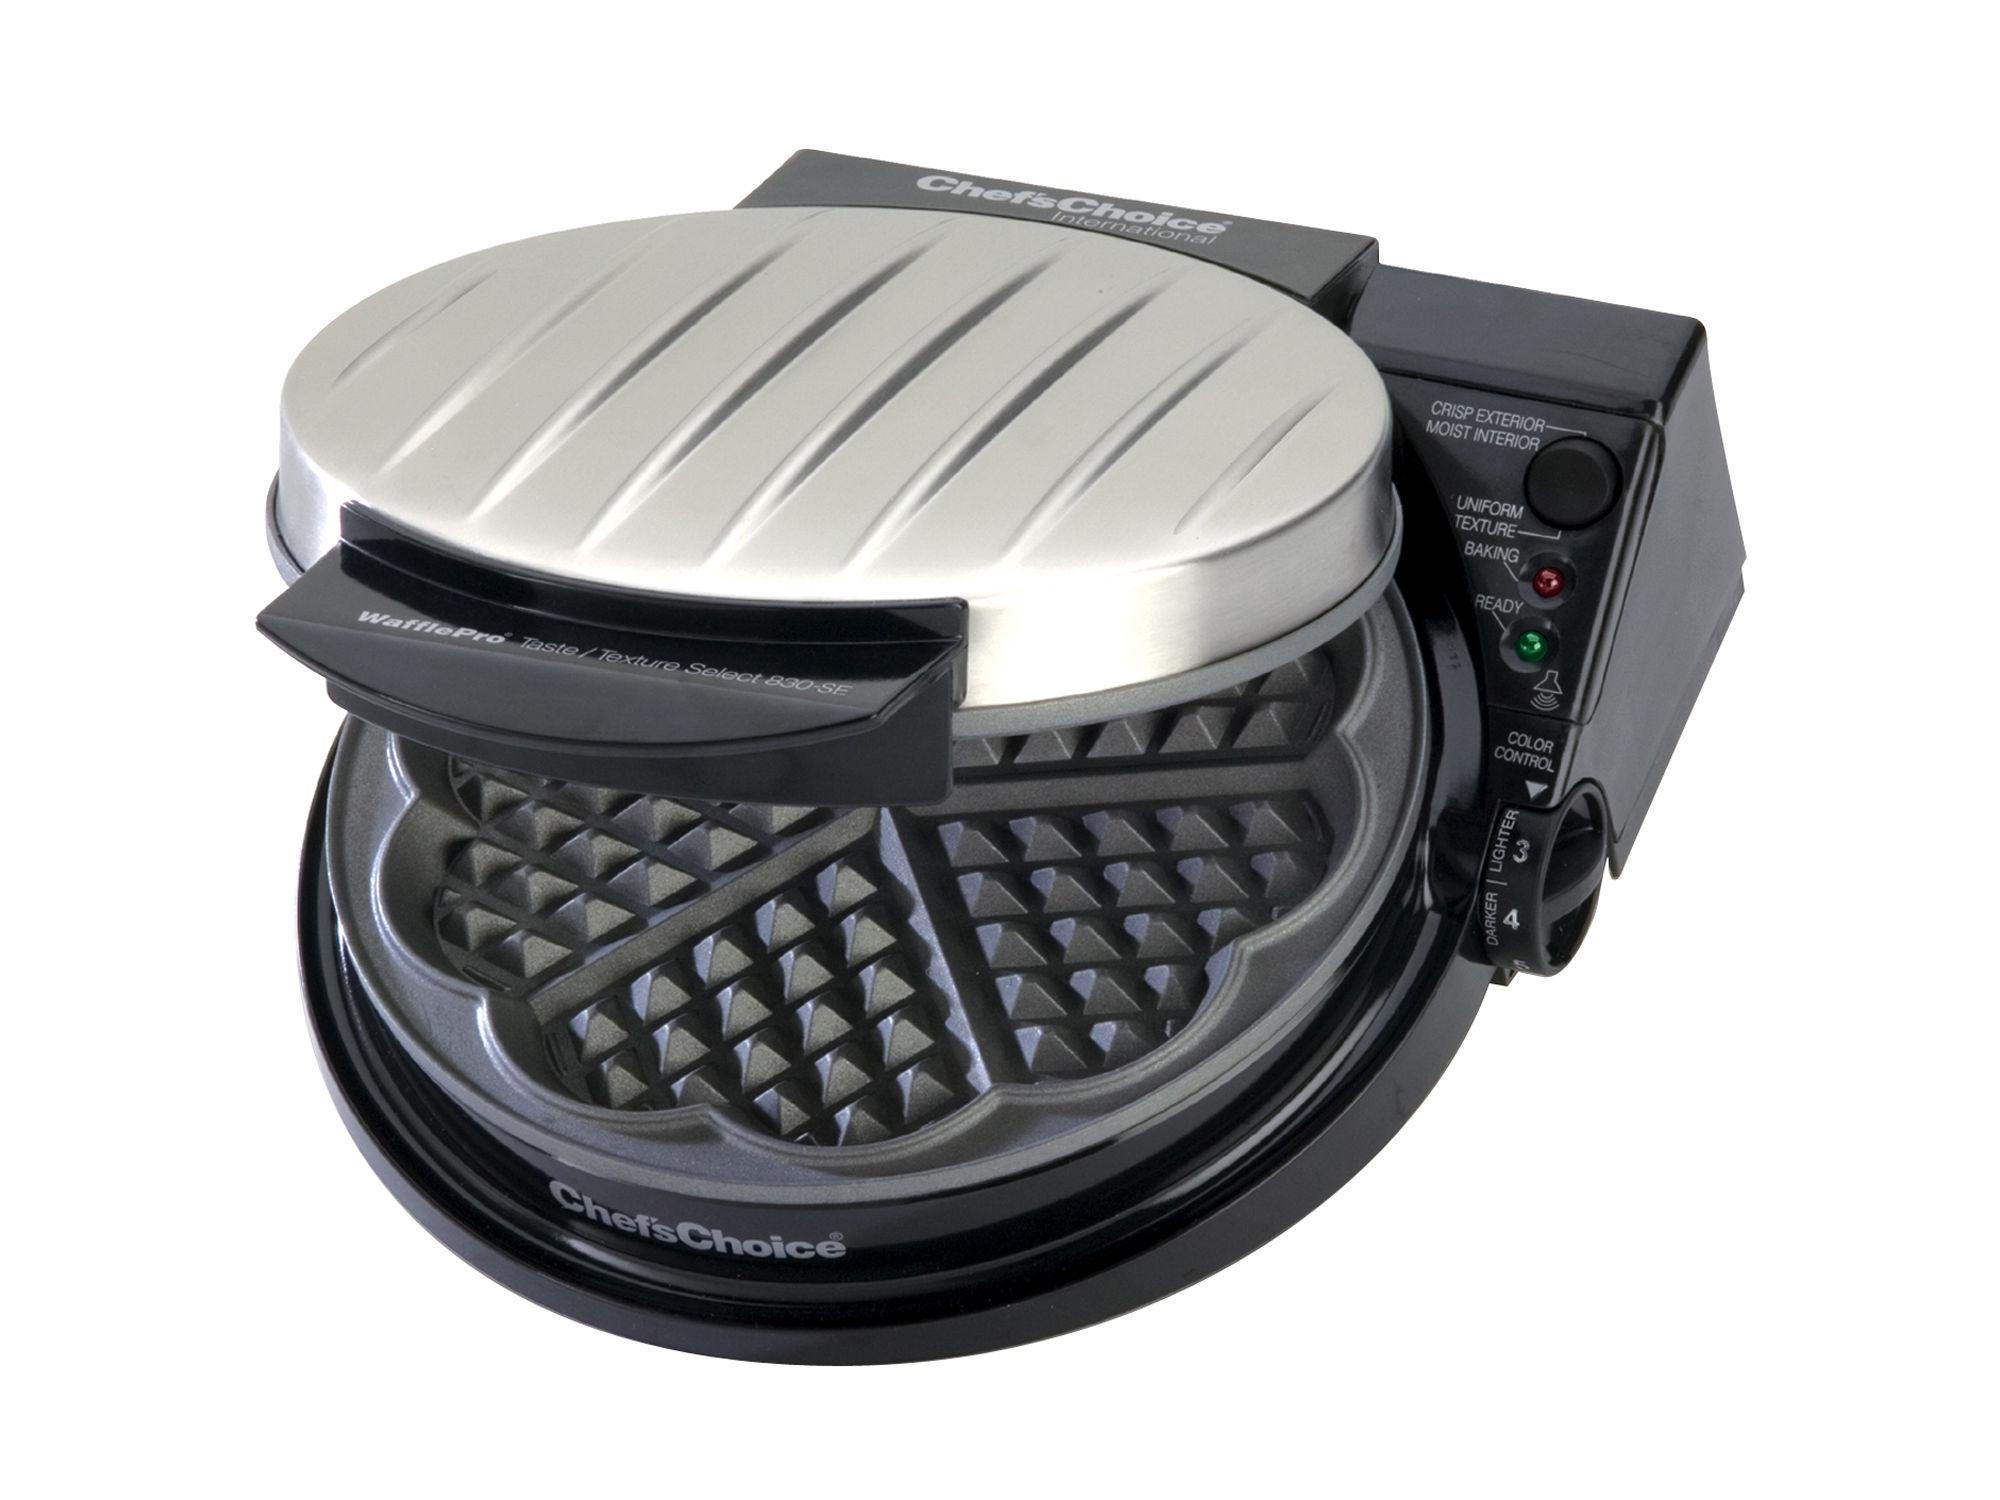 Chef's Choice Heart Waffle Maker 830-SE